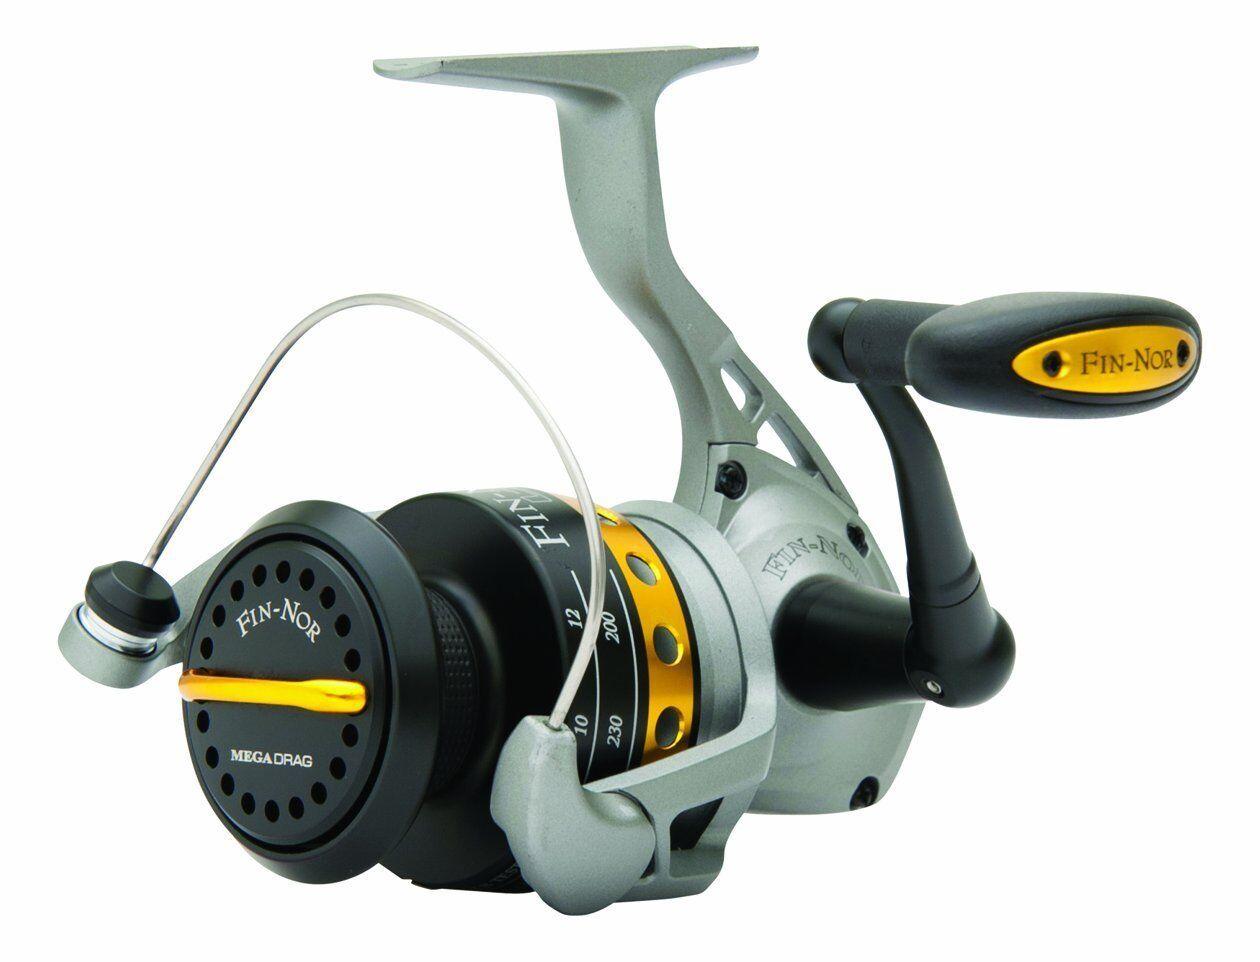 nuovo FinNor Lethal Spinning Reel 5.2 1 7BB 27030 23Lb Max Drag LT40